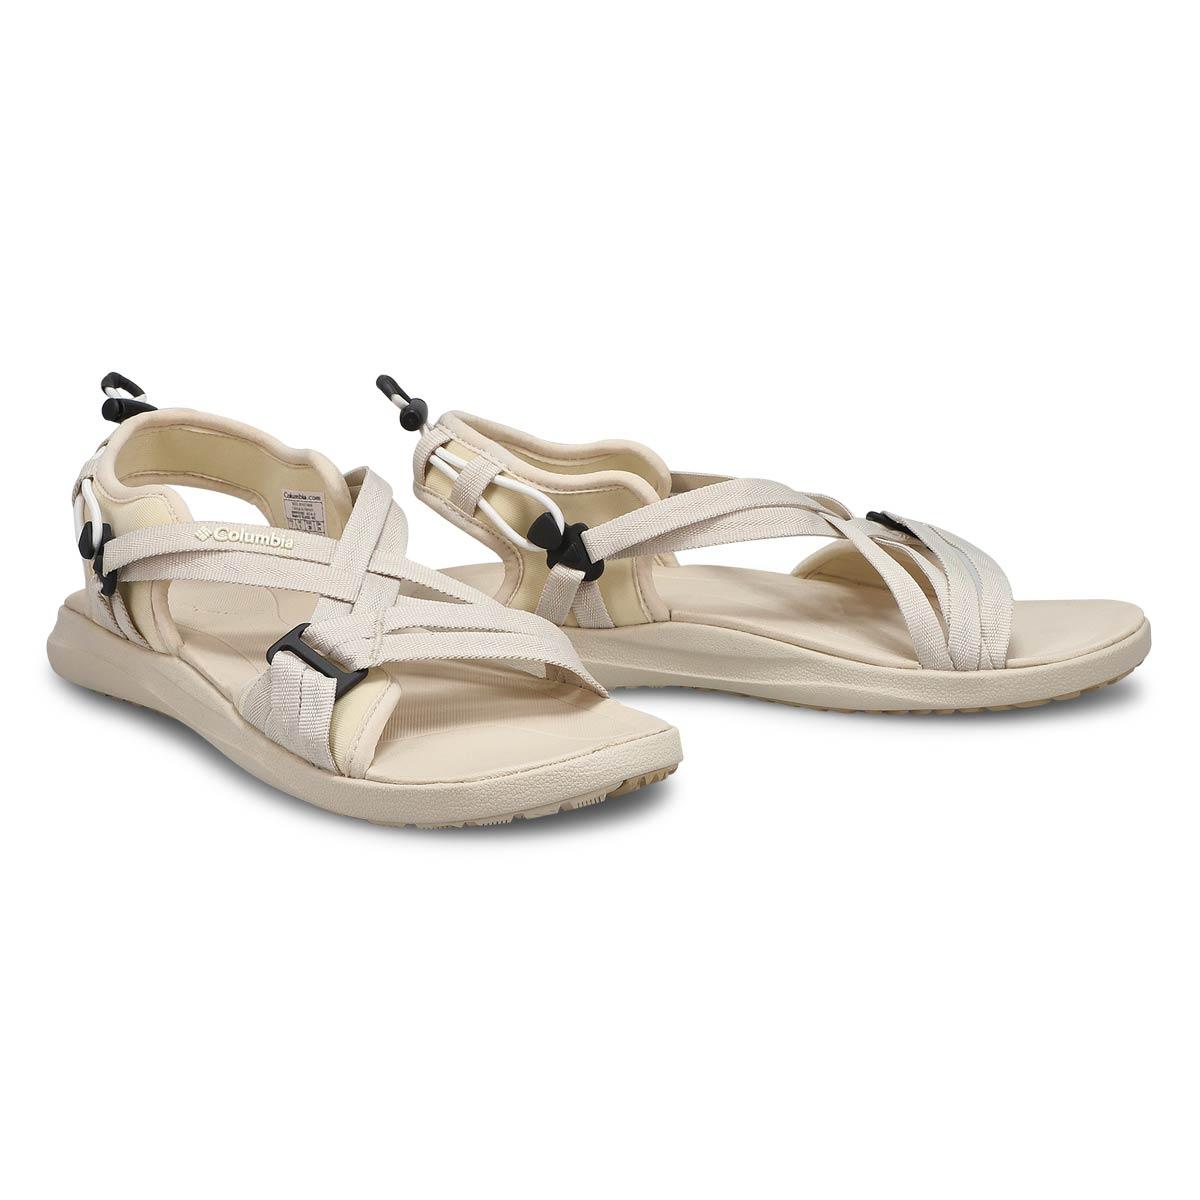 Women's Columbia Sport Sandal - White